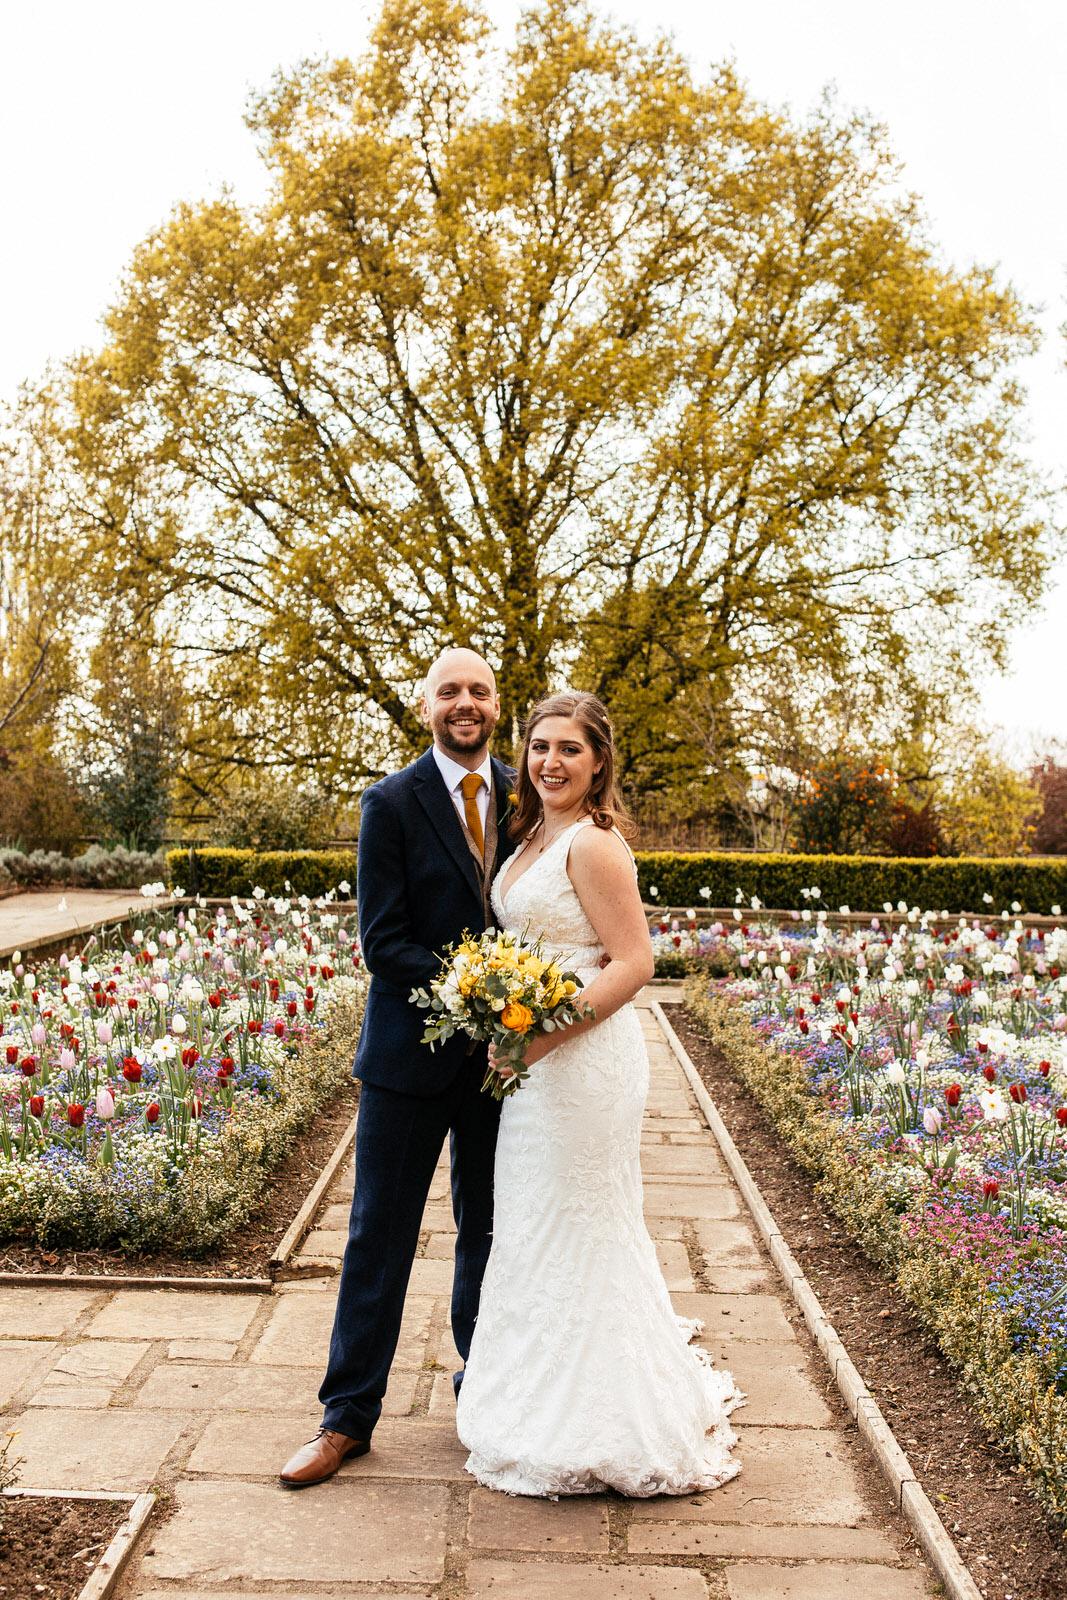 Jenni-and-James-Wedding-Highlights-37.jpg